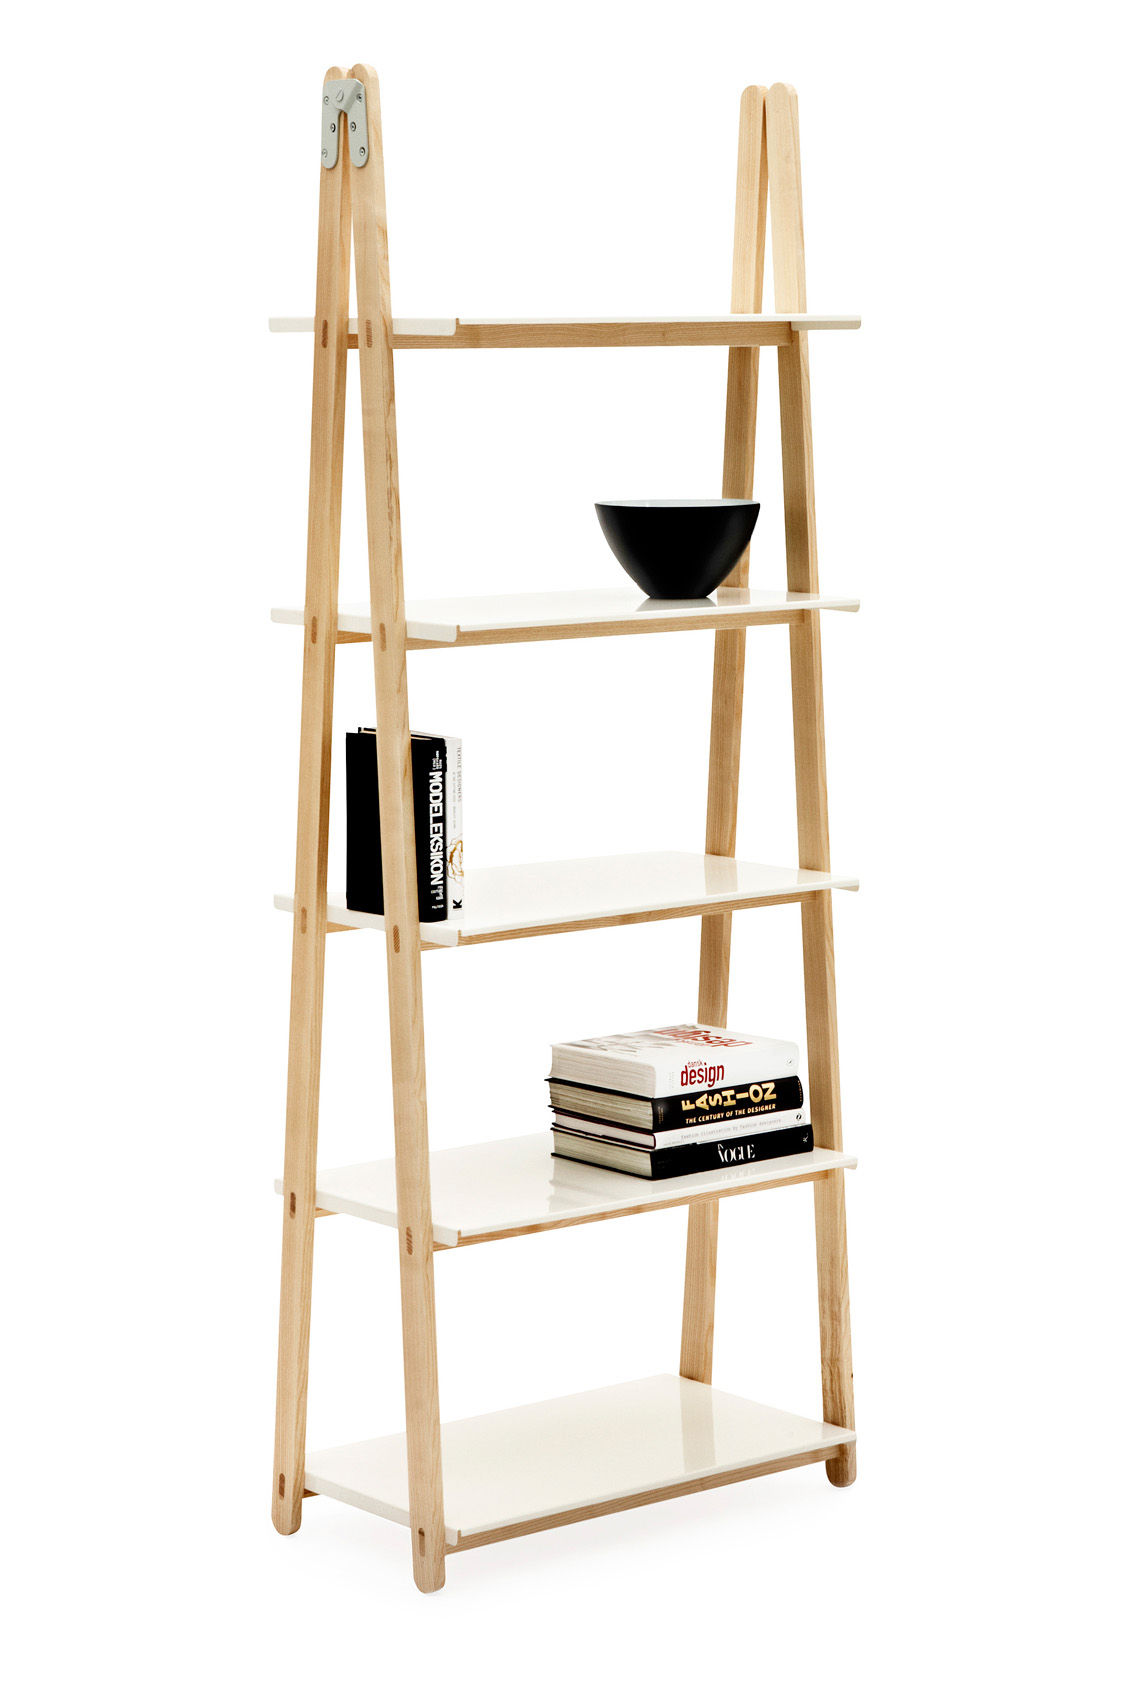 Furniture - Bookcases & Bookshelves - One Step Up Shelf - Bookcase by Normann Copenhagen - Wood / White - Ashwood, Painted aluminium